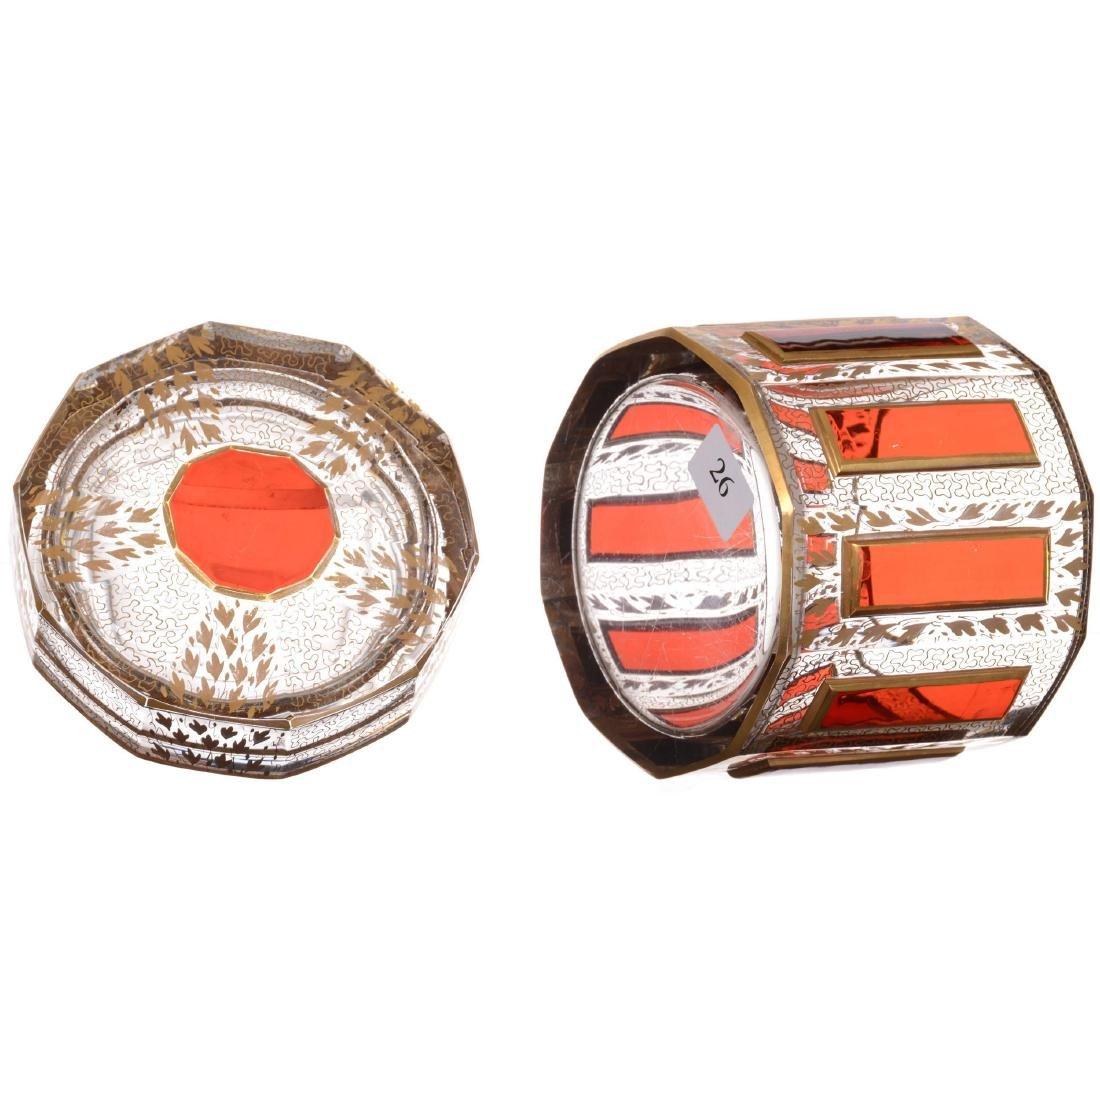 Bohemian Art Glass Covered Box - 2